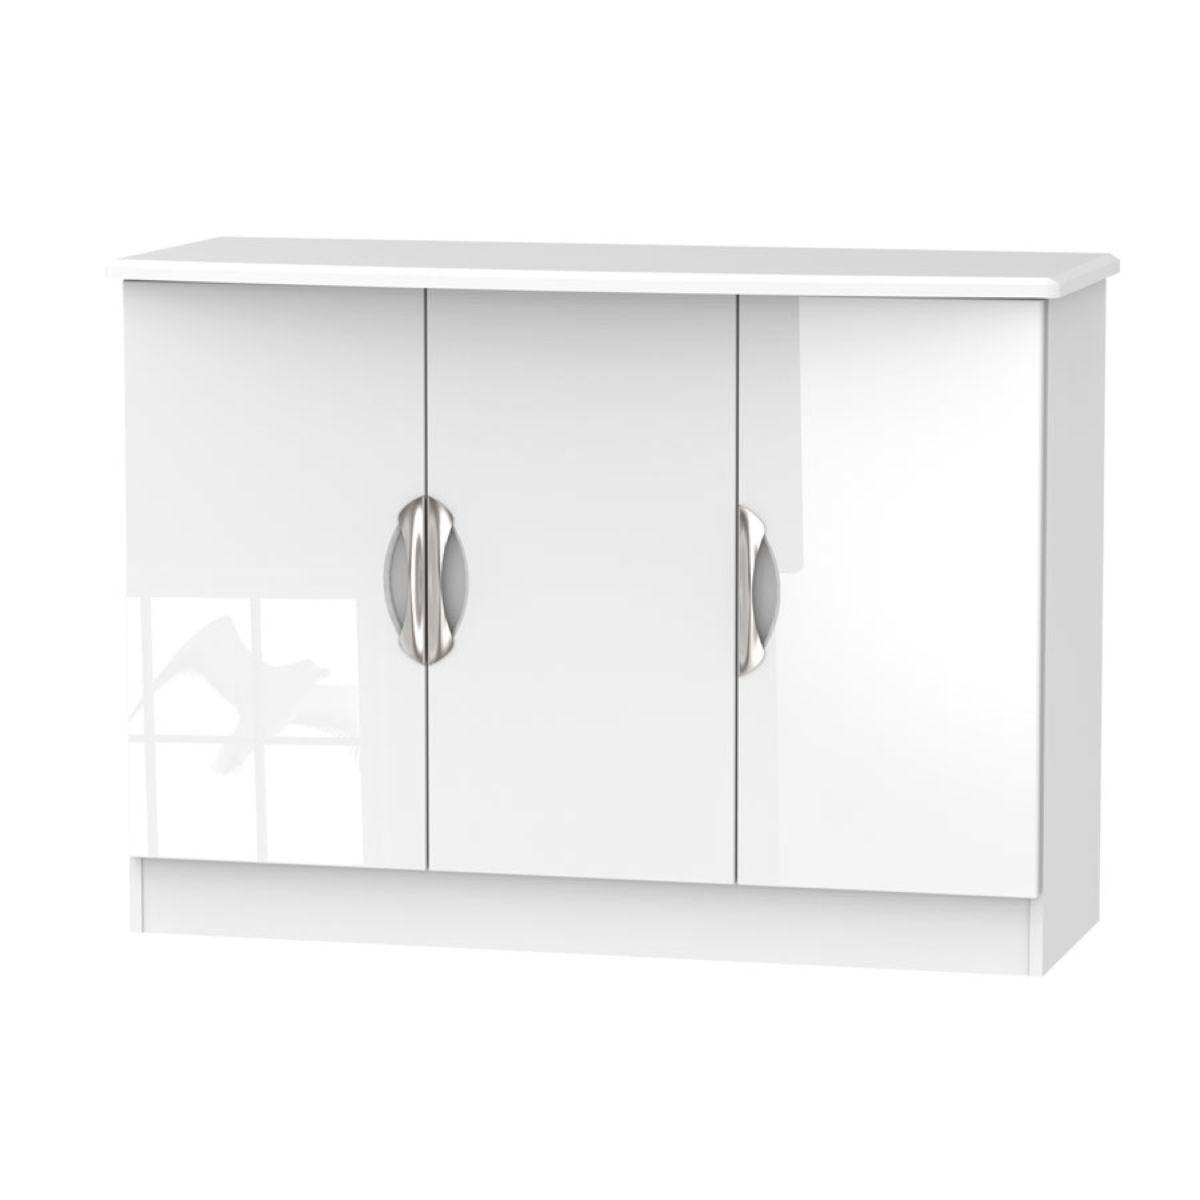 Indices Triple Door Sideboard - White